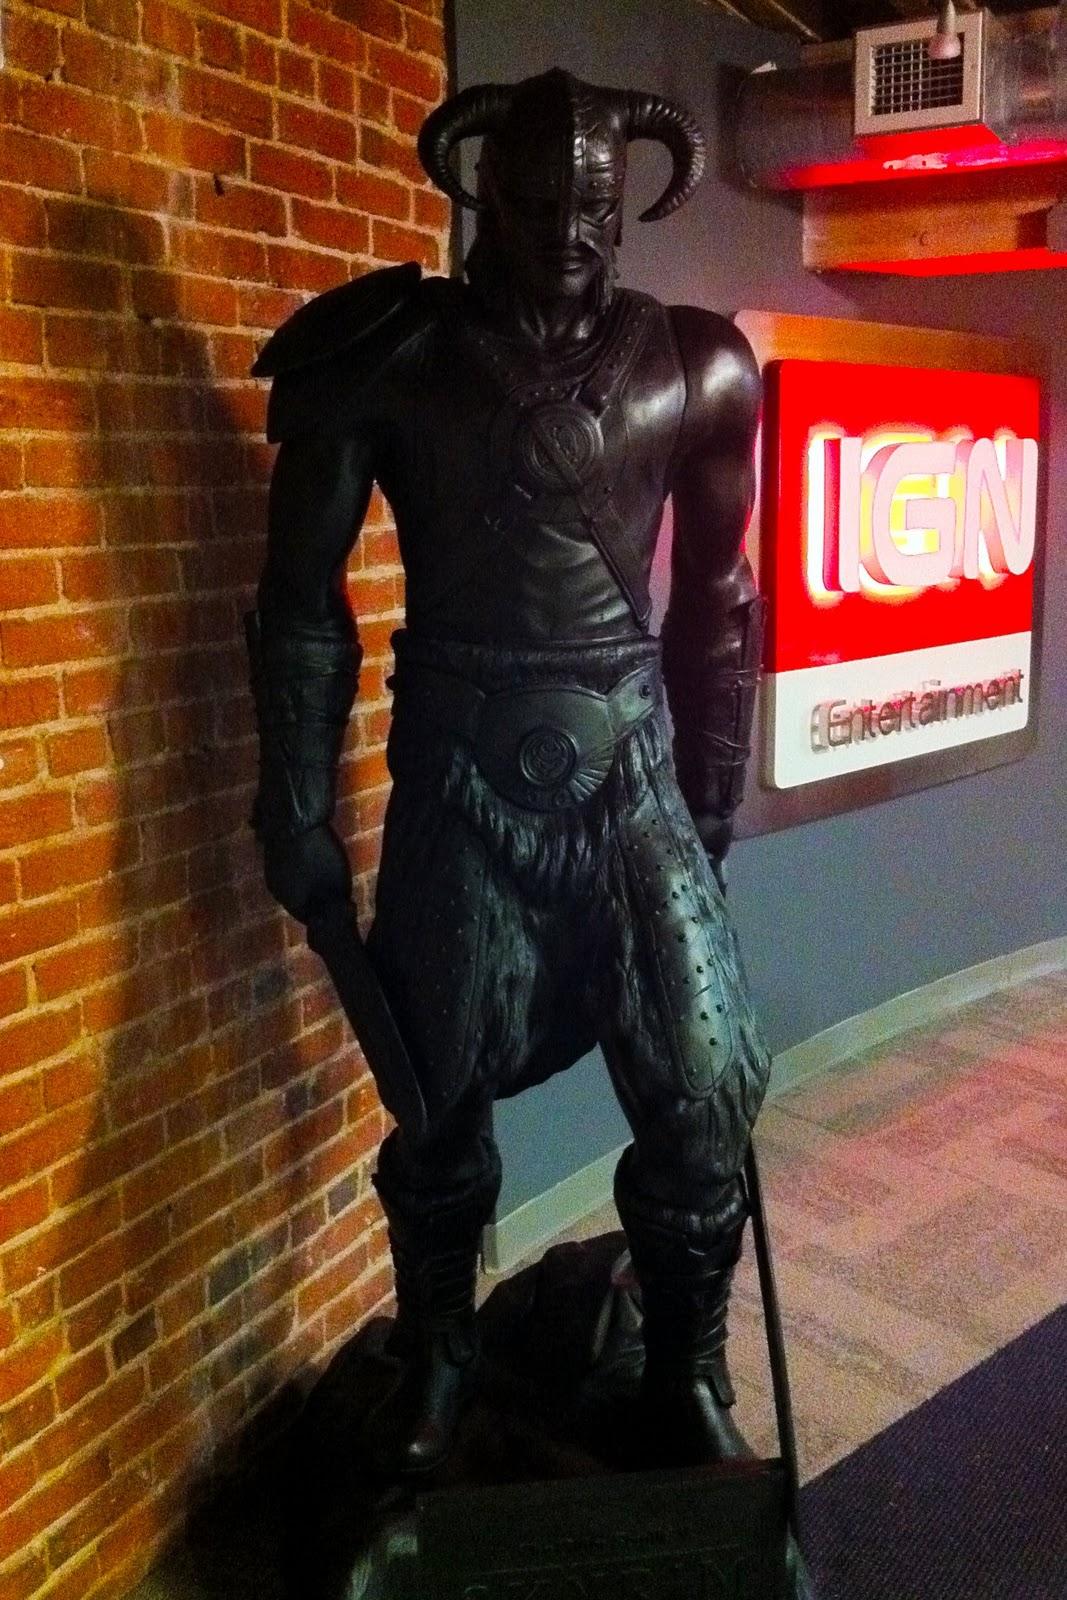 http://4.bp.blogspot.com/-E-UjzNxT6bM/TsI5plr06JI/AAAAAAAAAho/sjPswwVzUwI/s1600/dragonborn-dovahkiin-statue-ign.jpg